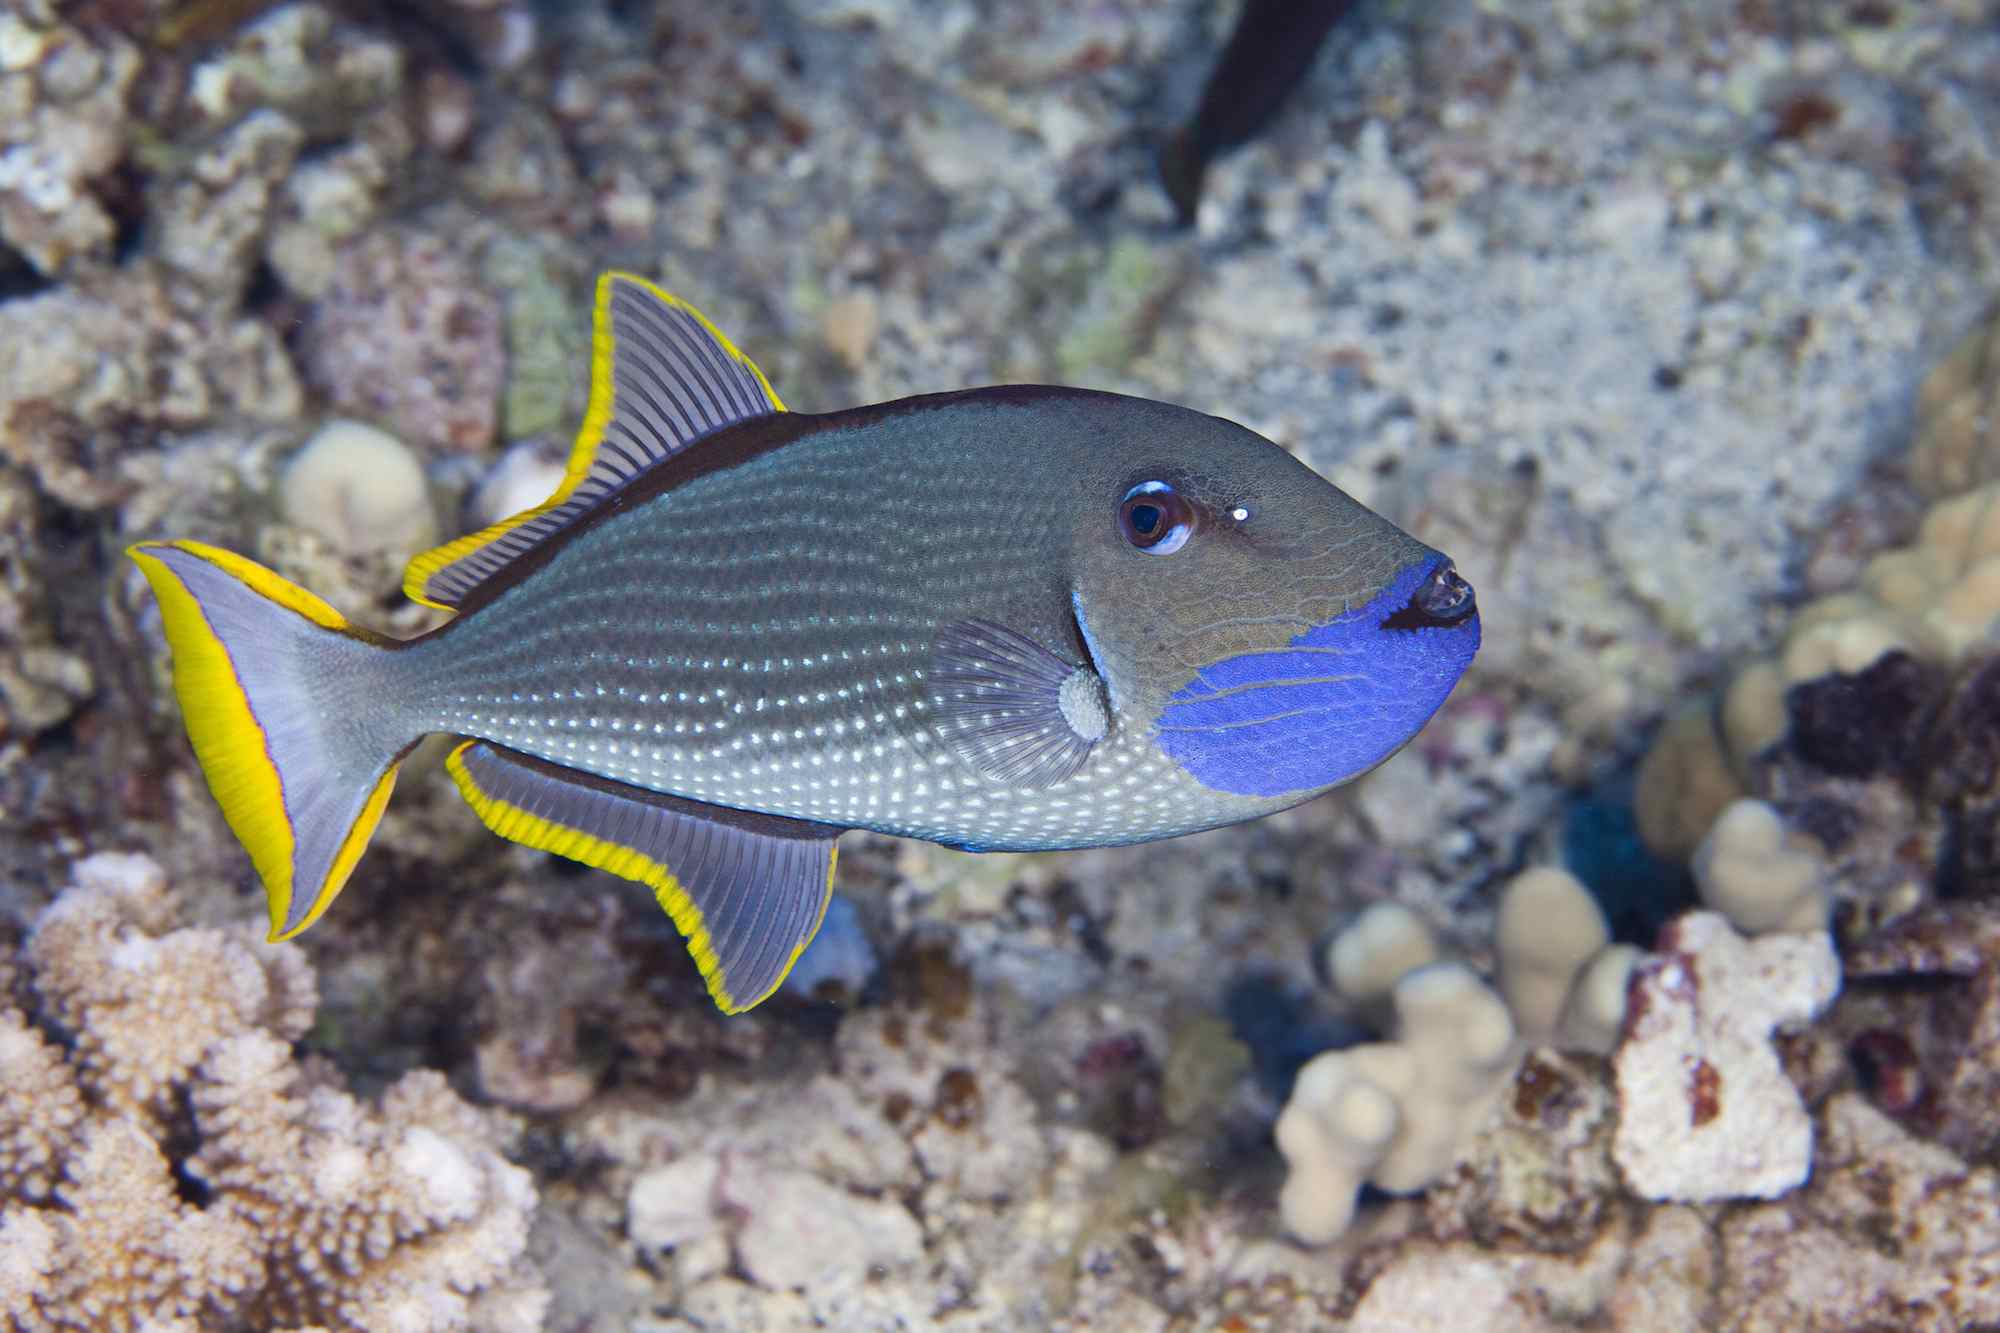 10 Ways to Save Money With Your Aquarium